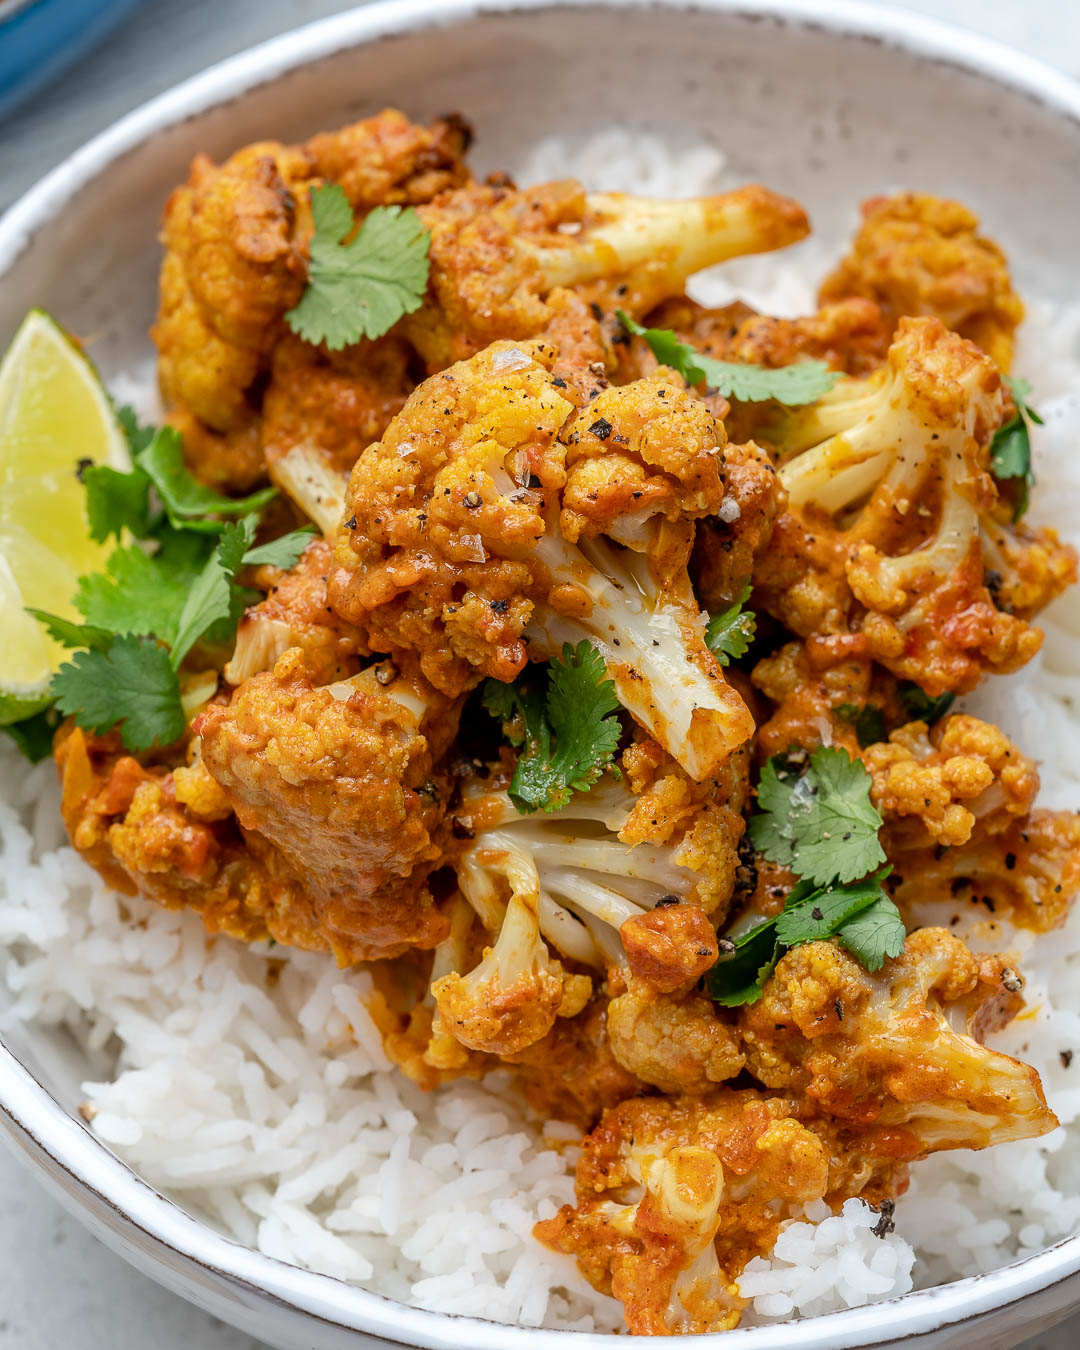 Mancare Indiana De Conopida (Curry Vegan, Paleo & Whole30) 9